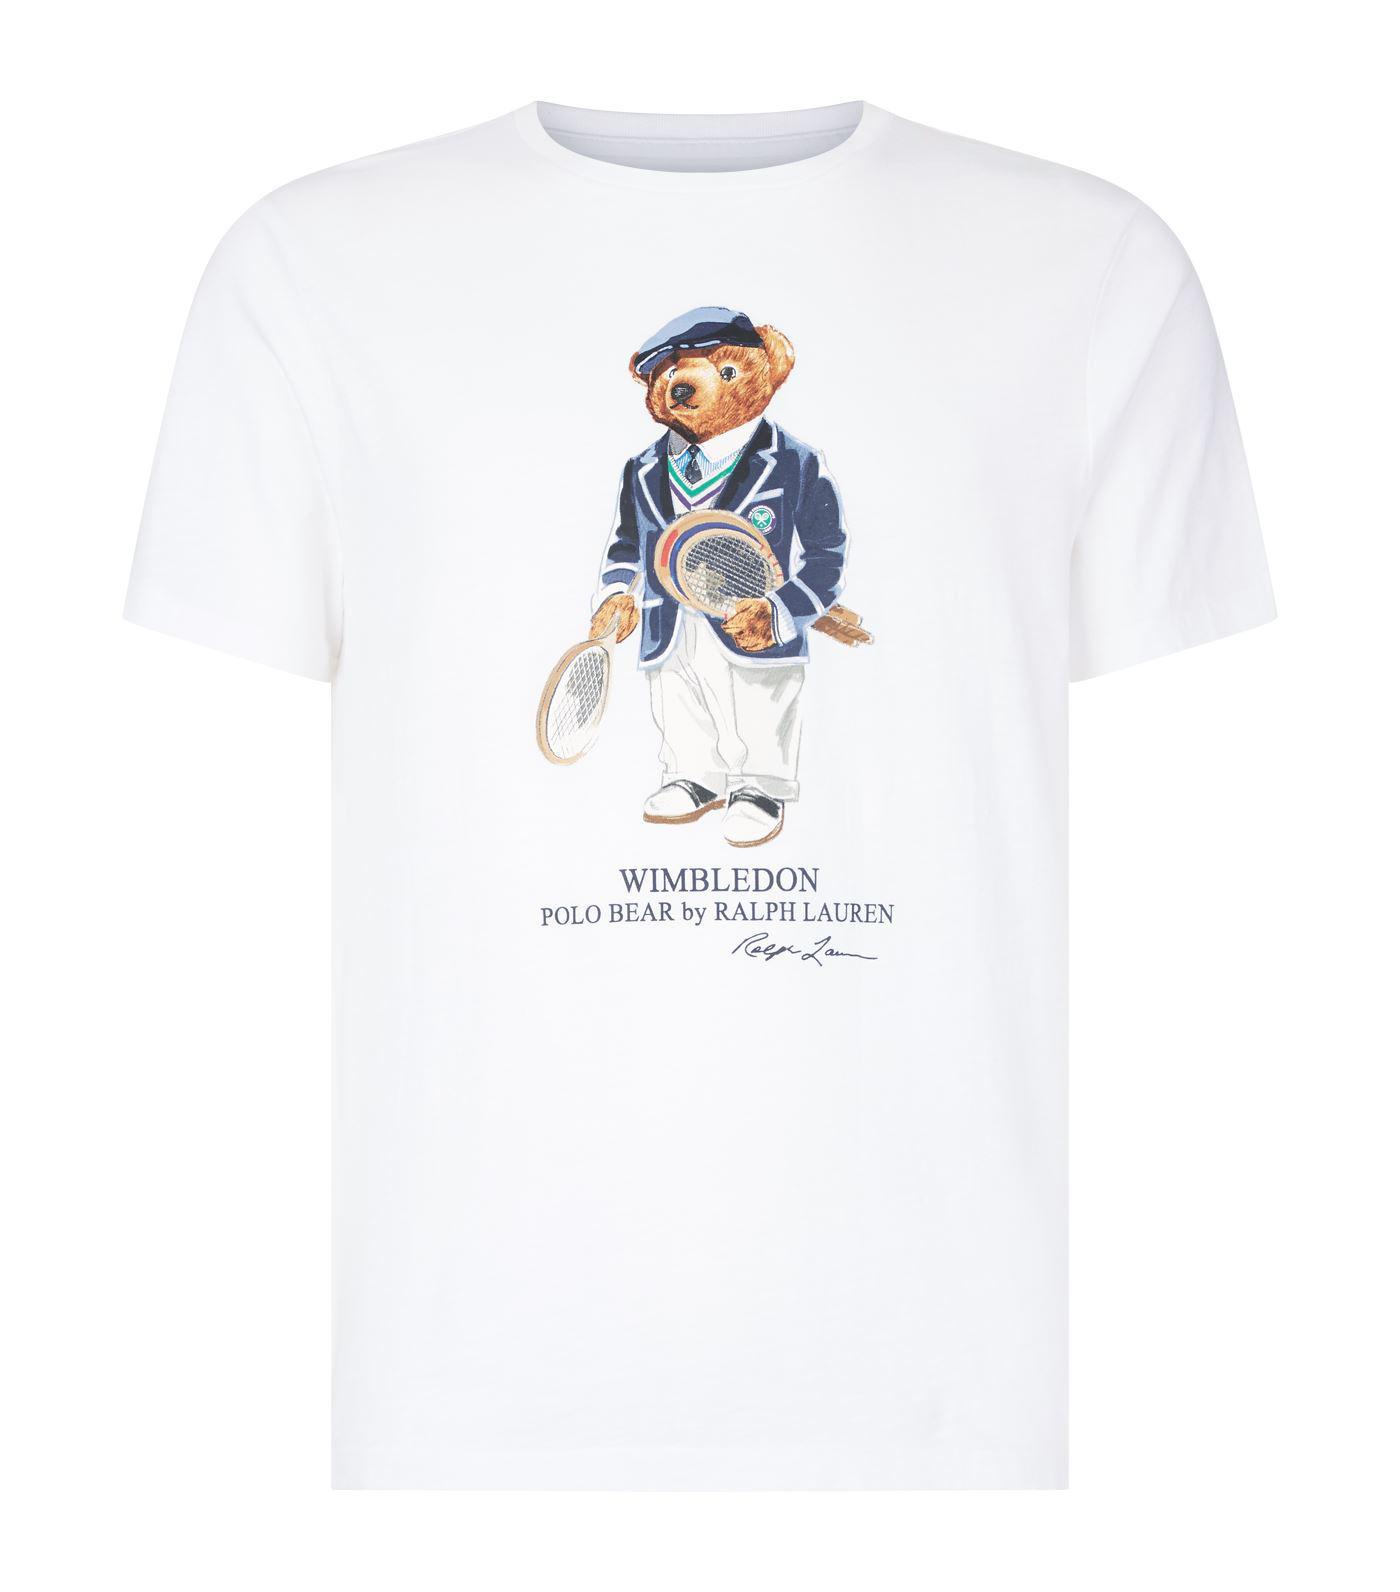 Polo Ralph Lauren Wimbledon Polo Bear T-shirt in White for Men - Lyst 61ae765e155